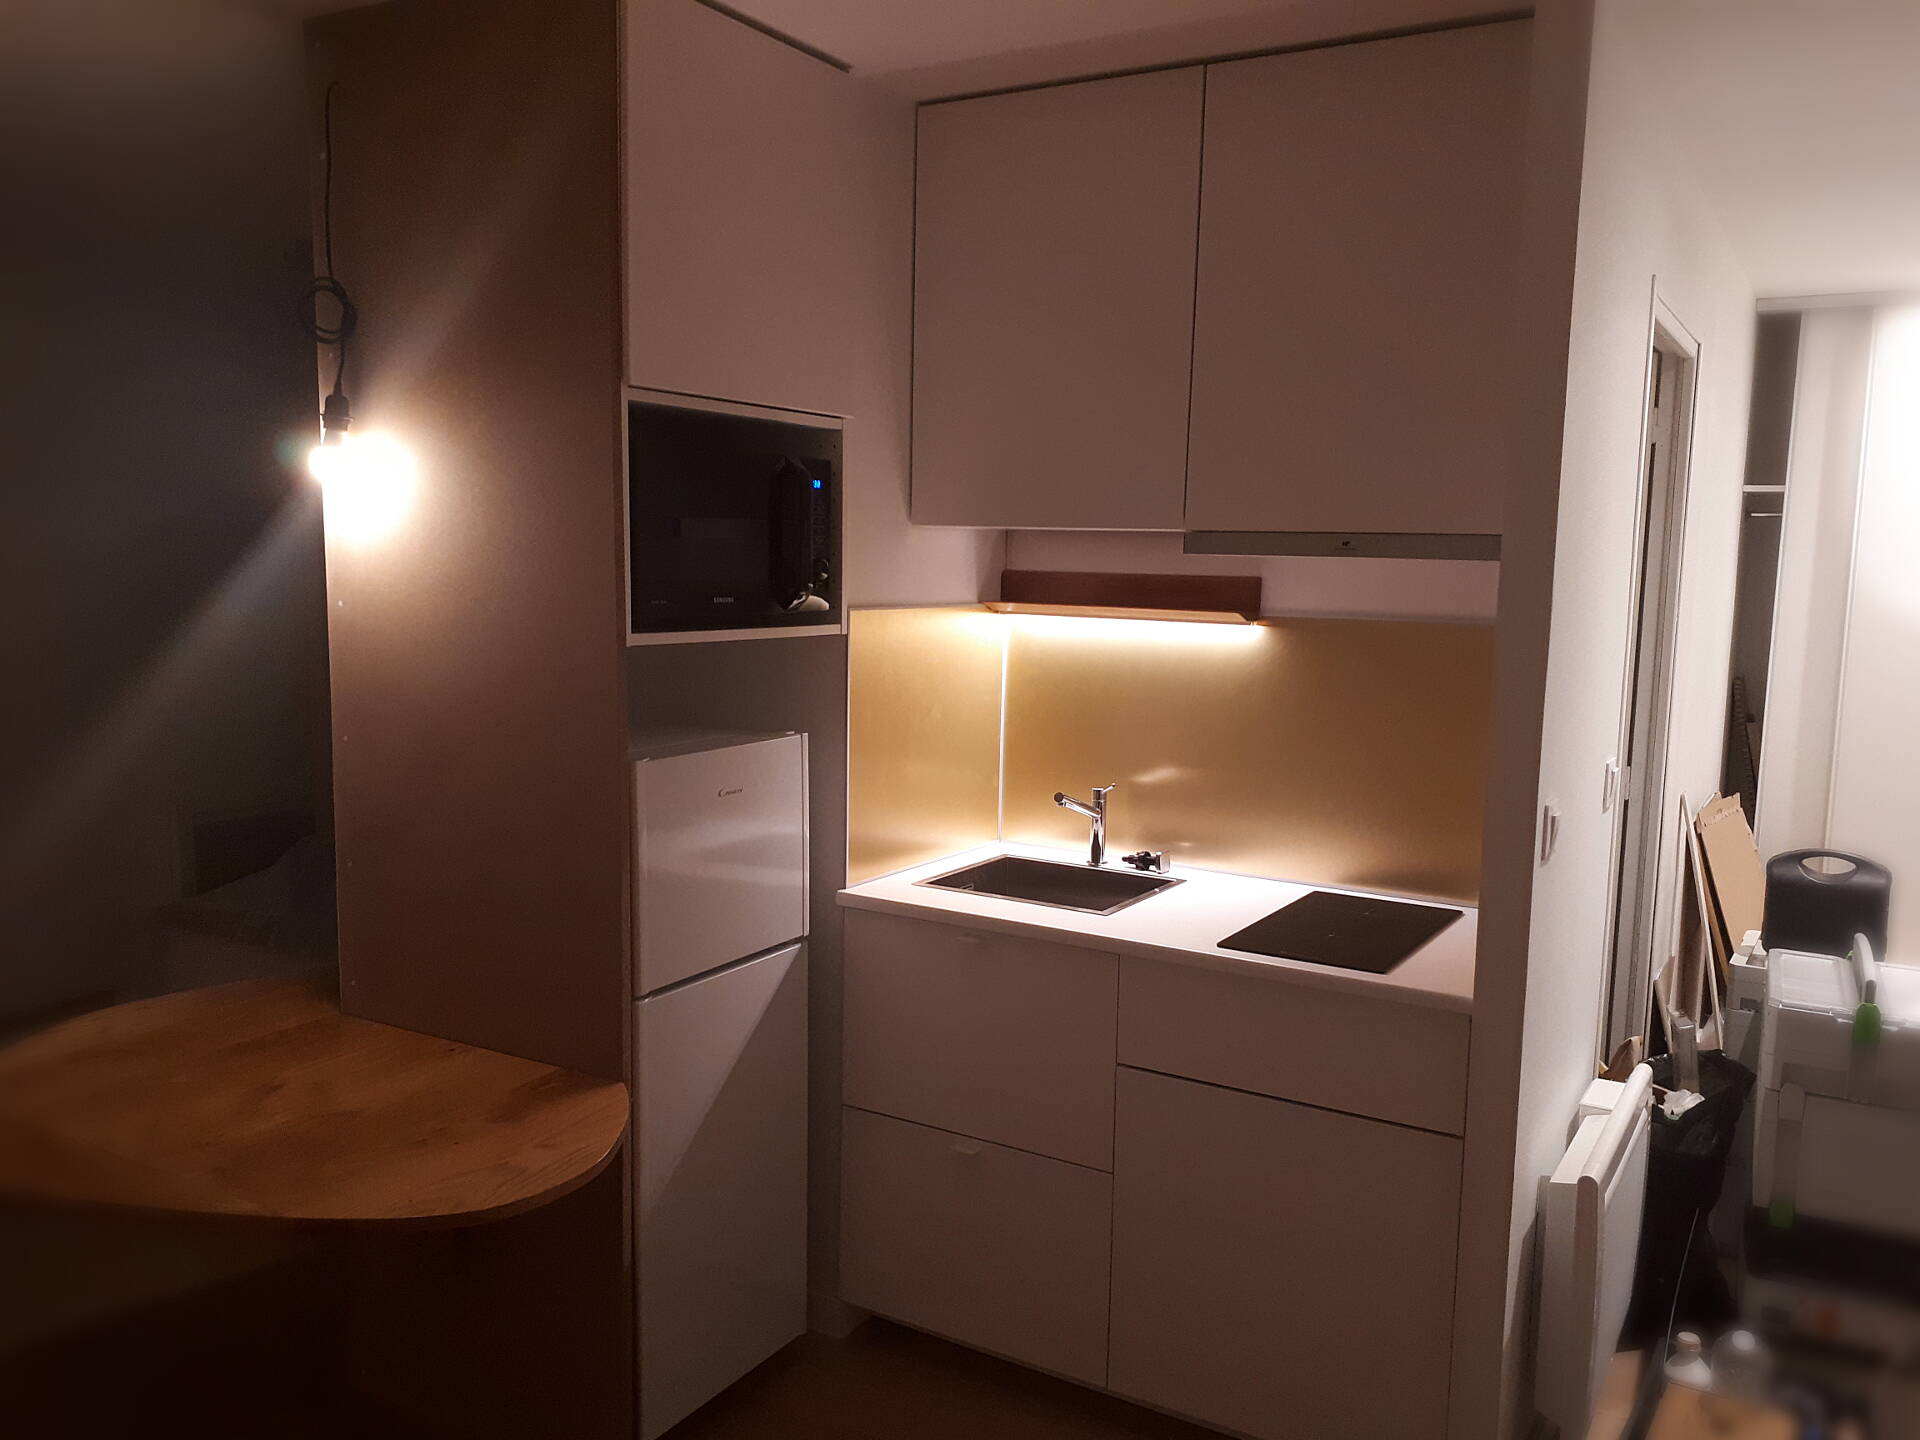 Installation D Une Cuisine Ikea Atelier Leman